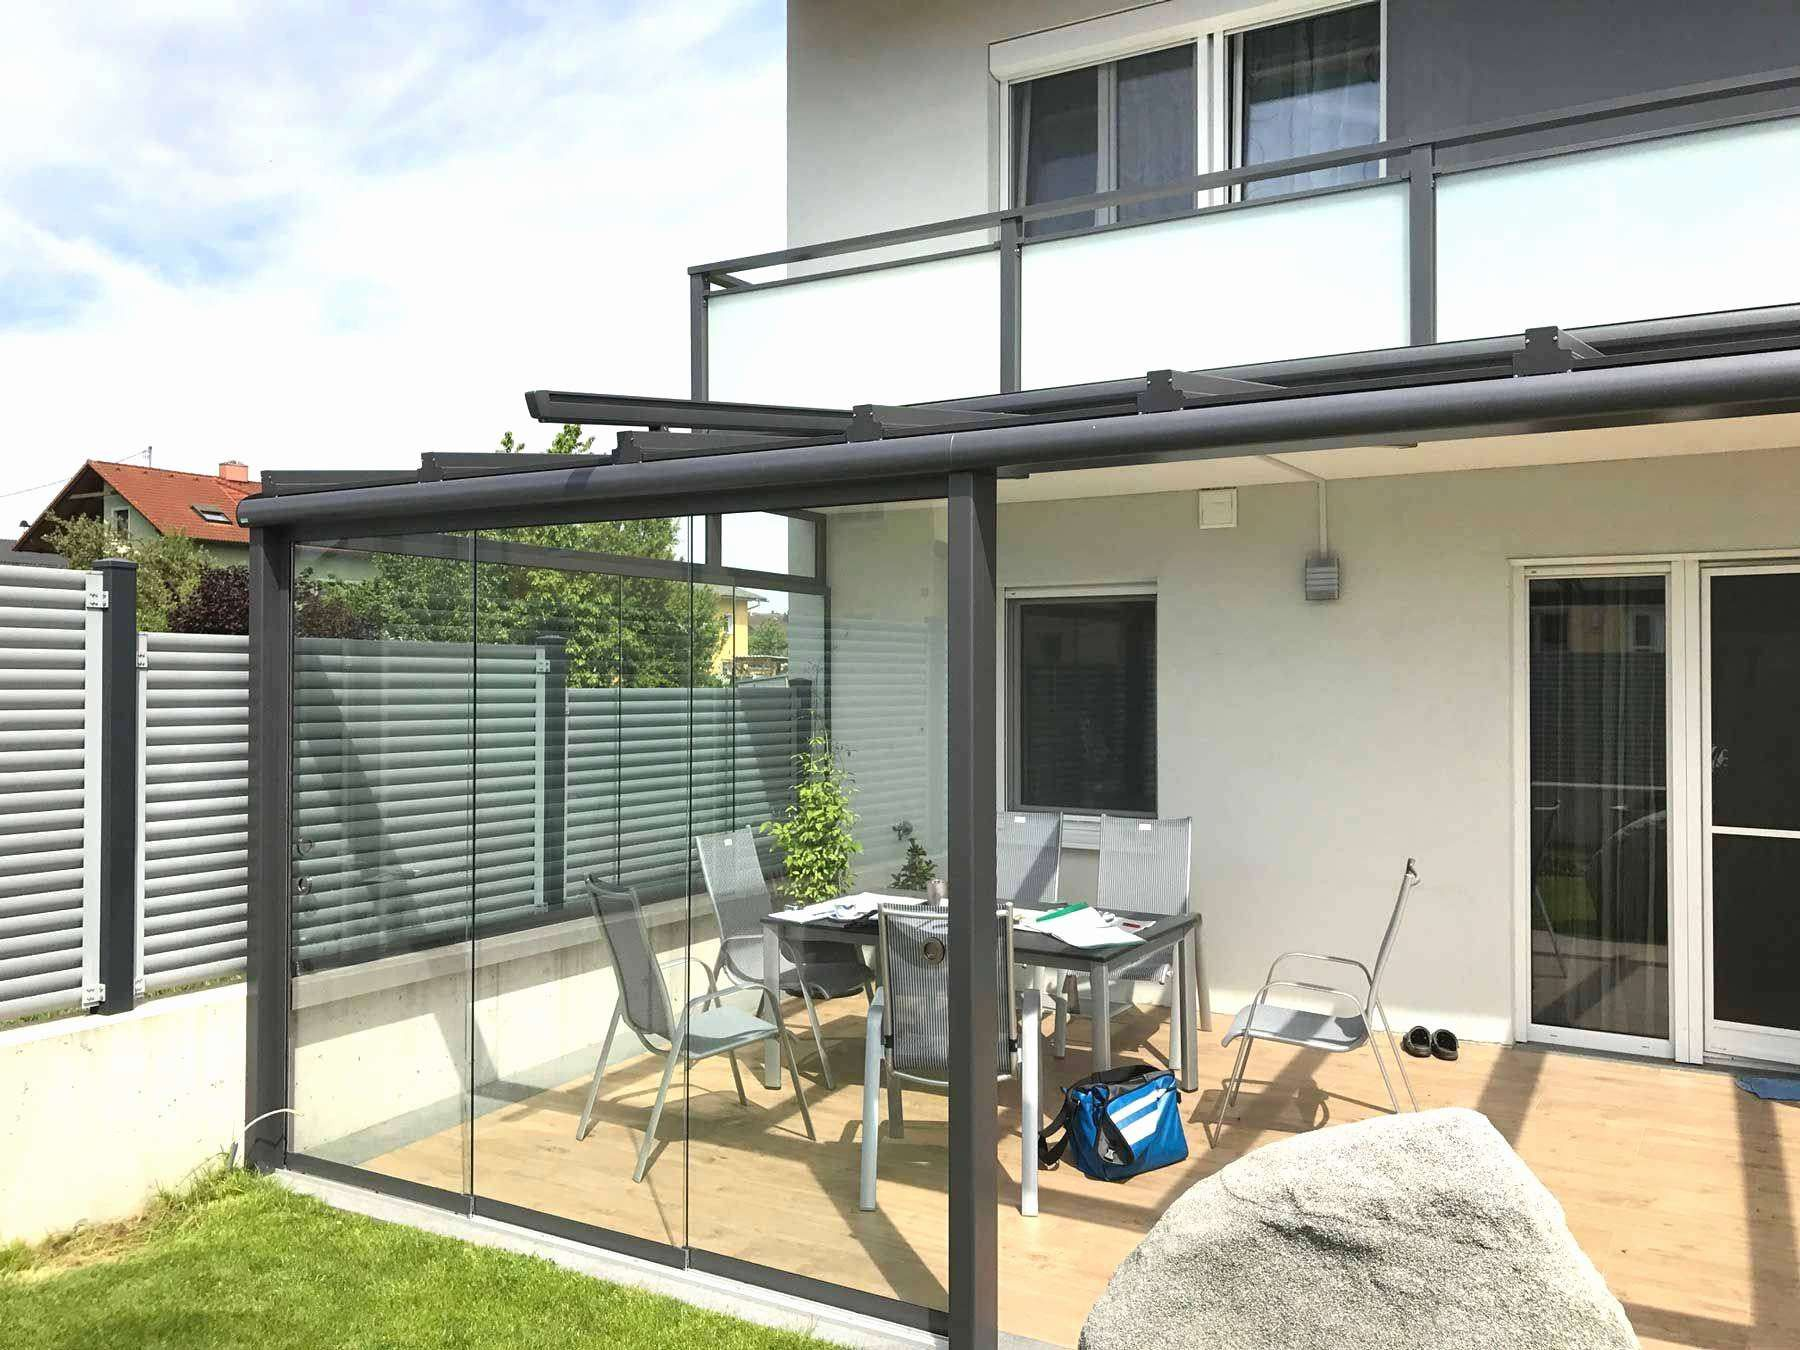 Einzigartig 45 Fur Windschutz Balkon Plexiglas Kanopi Minimalis